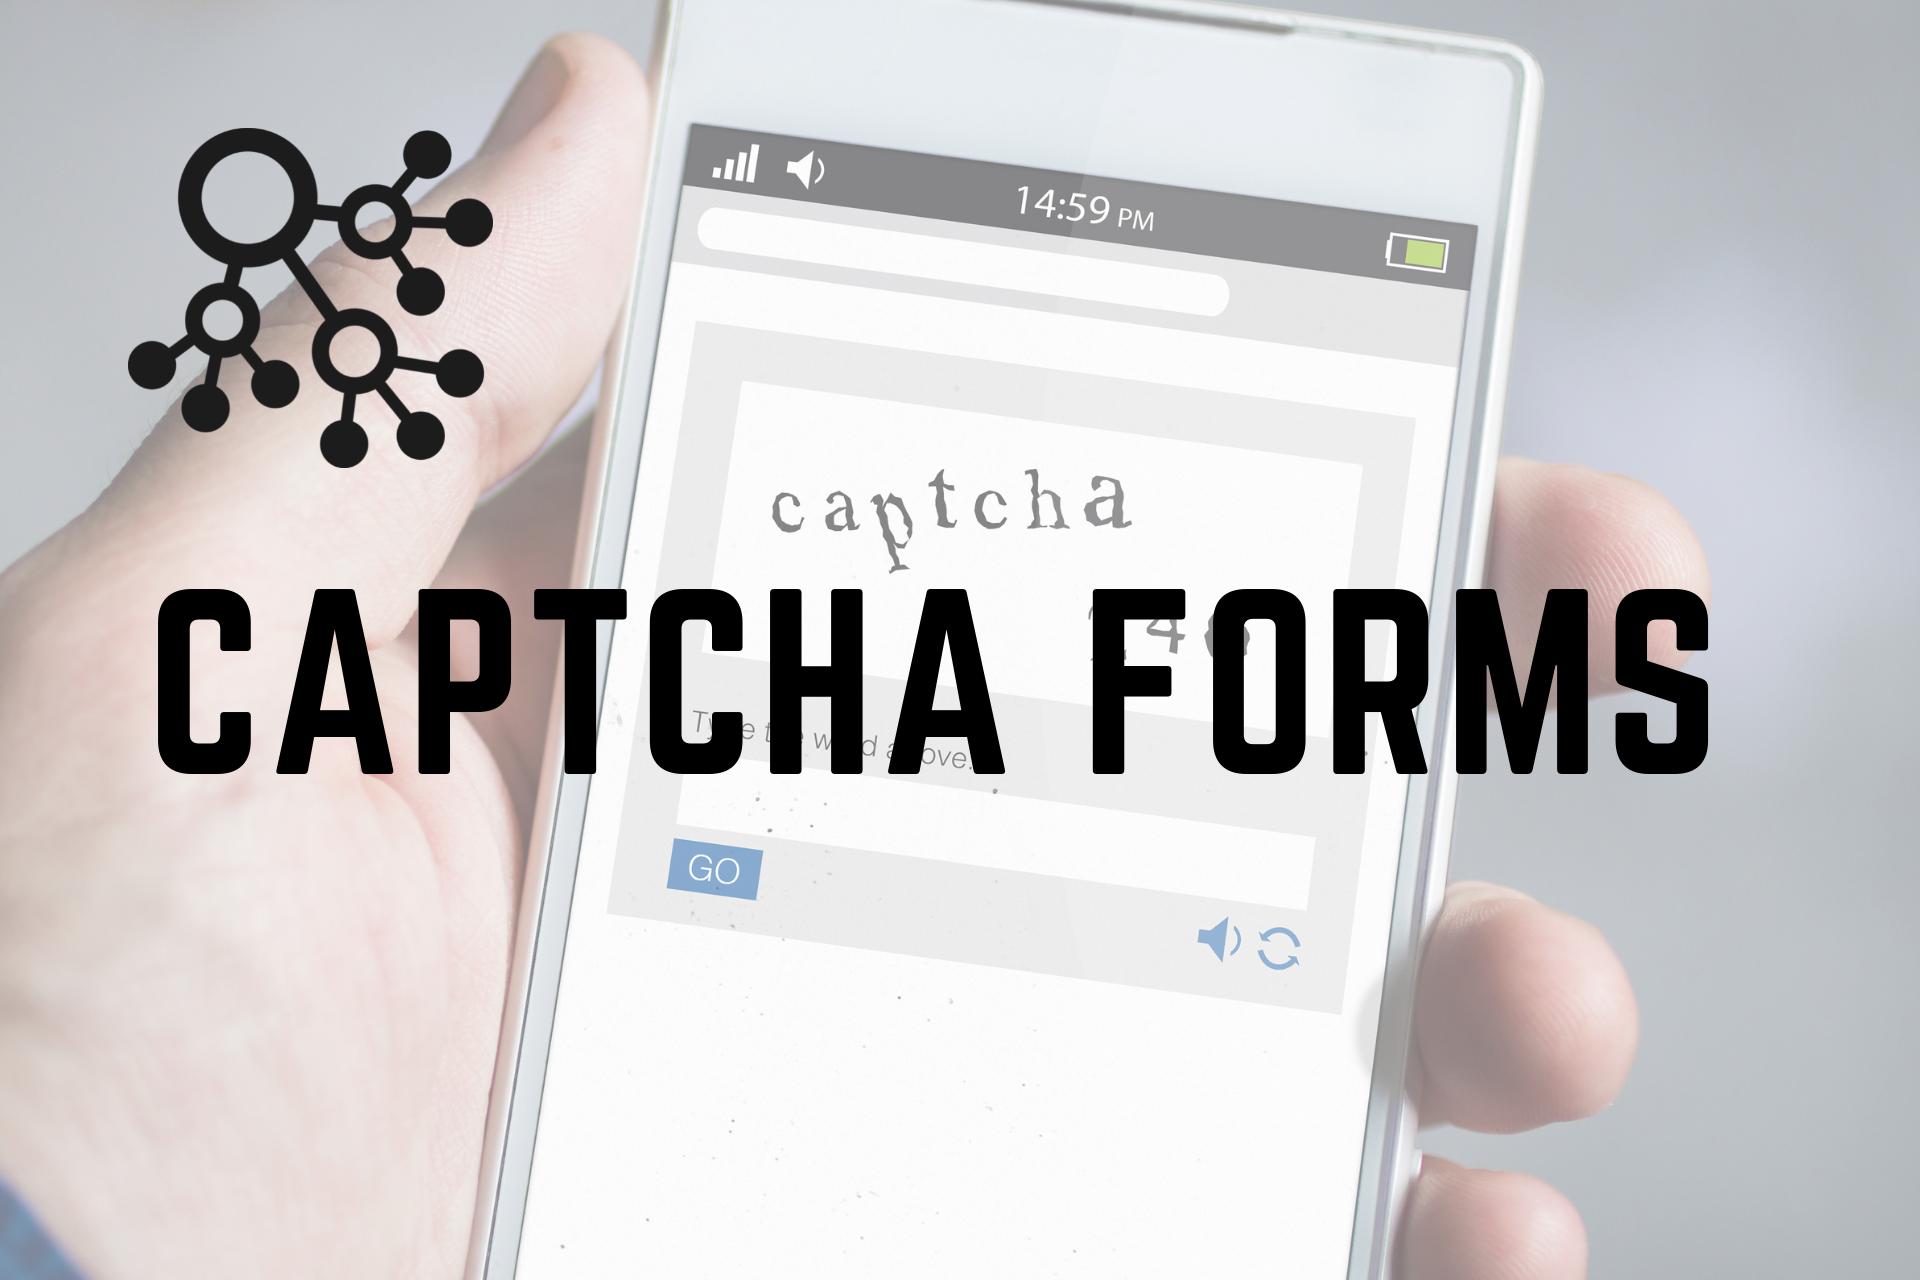 Captcha forms